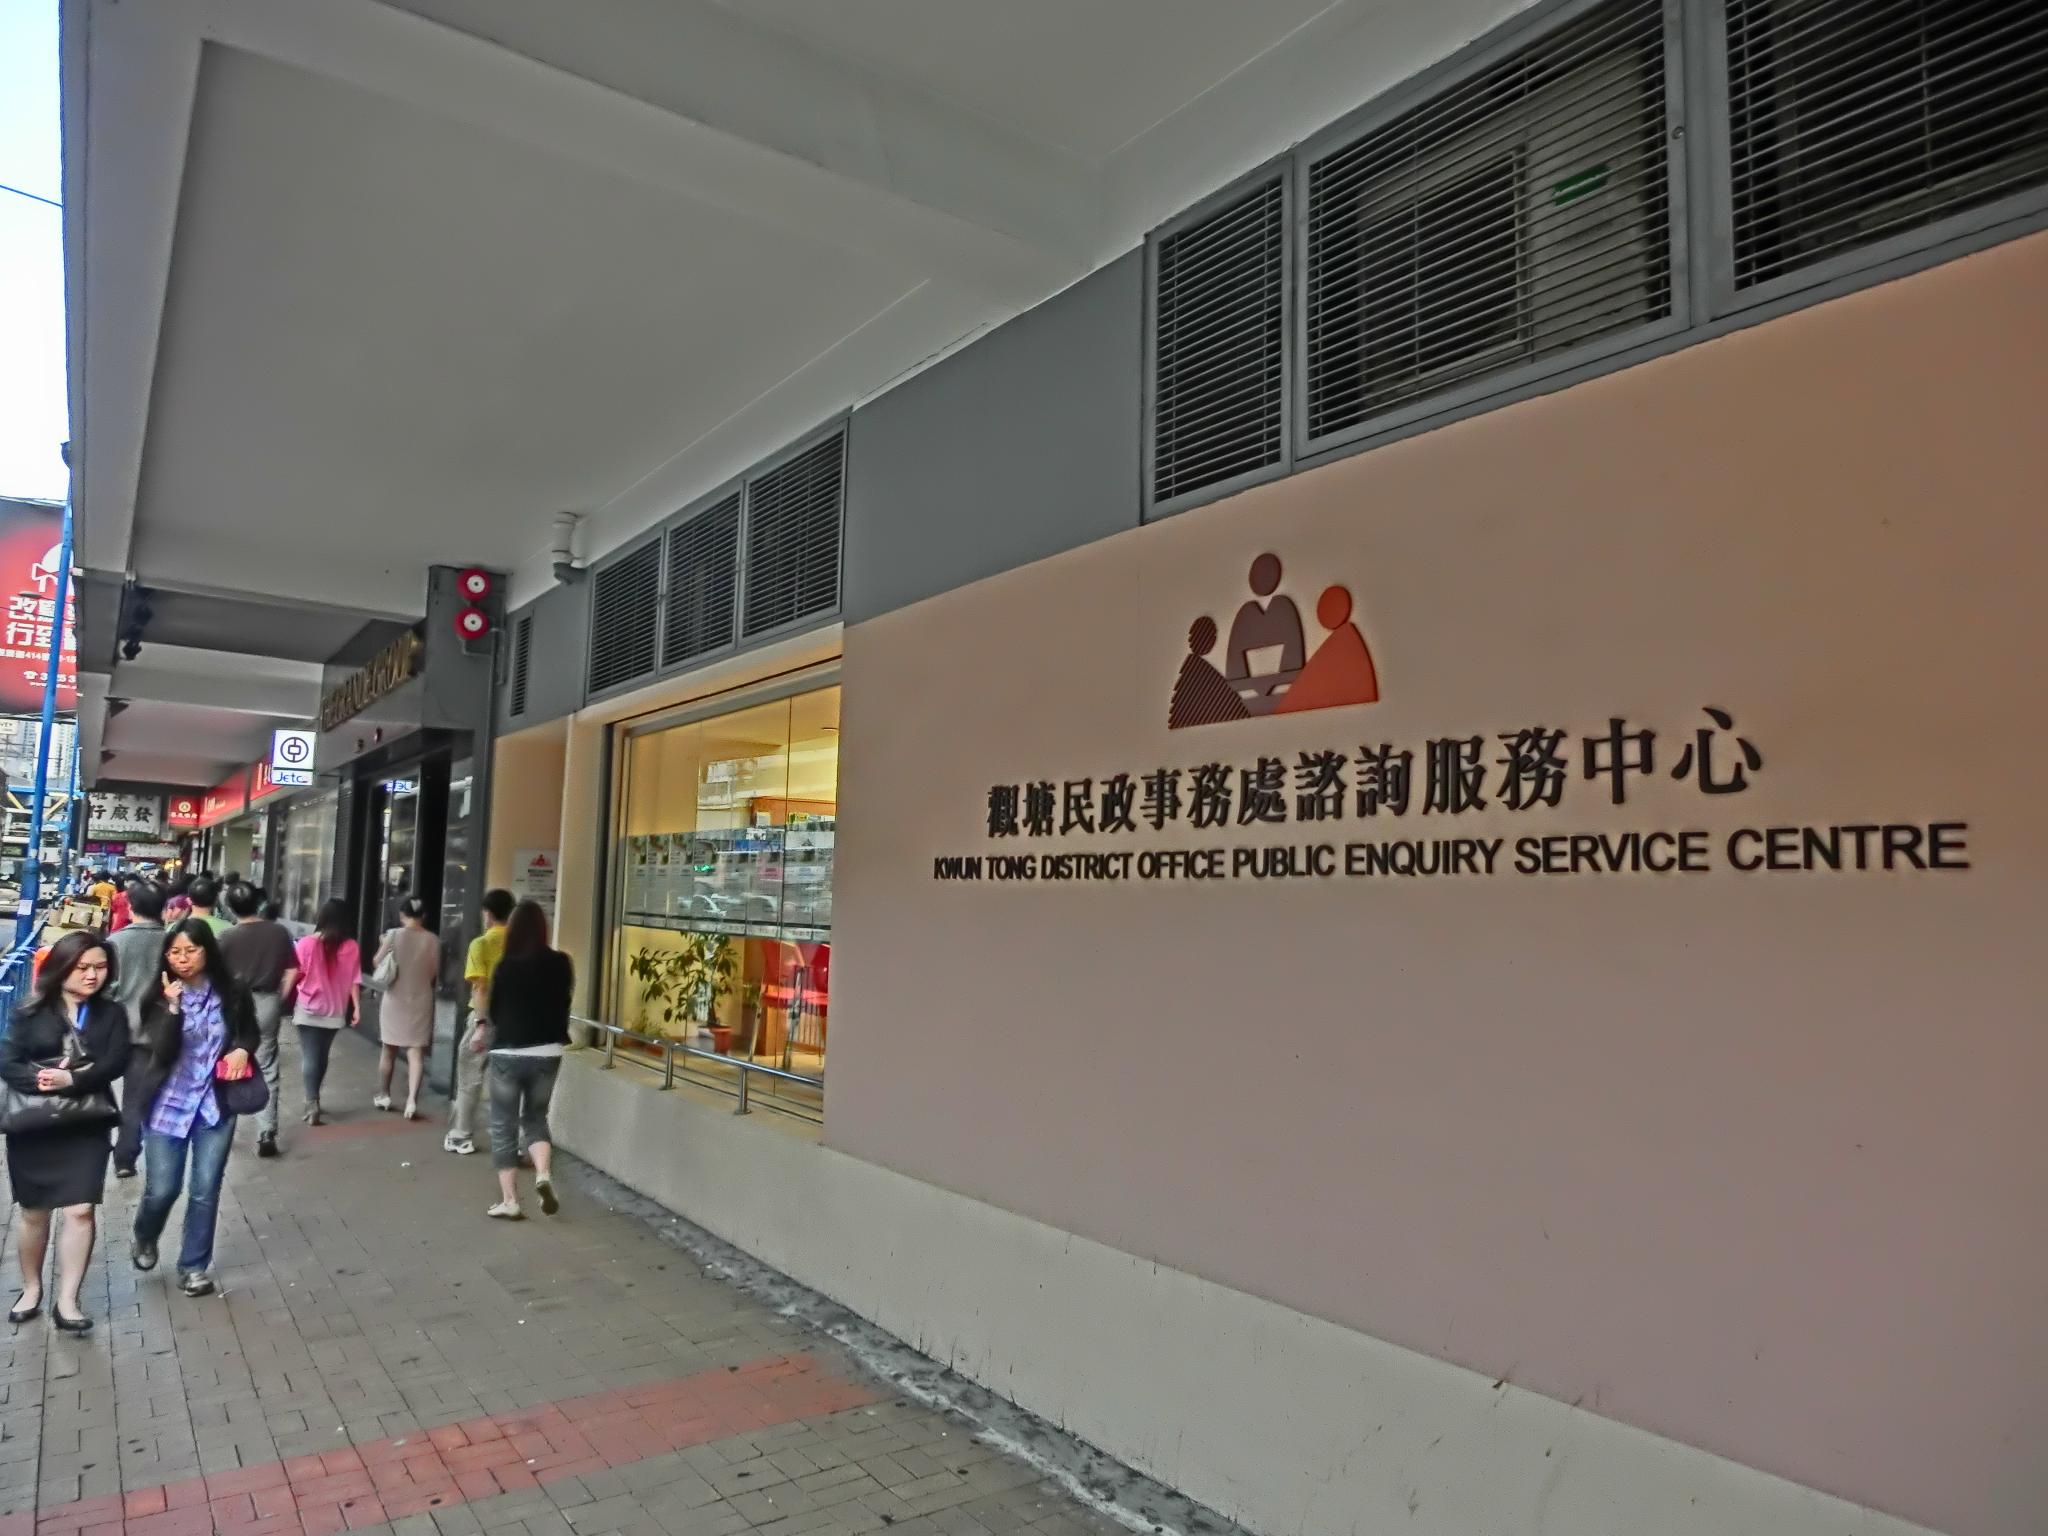 File:HK 398 Kwun Tong Rd 嘉域大廈 Grande Building 觀塘民政處 KTDO 諮詢服務中心 PESC Kwun Tong District Office Public Enquiry ...